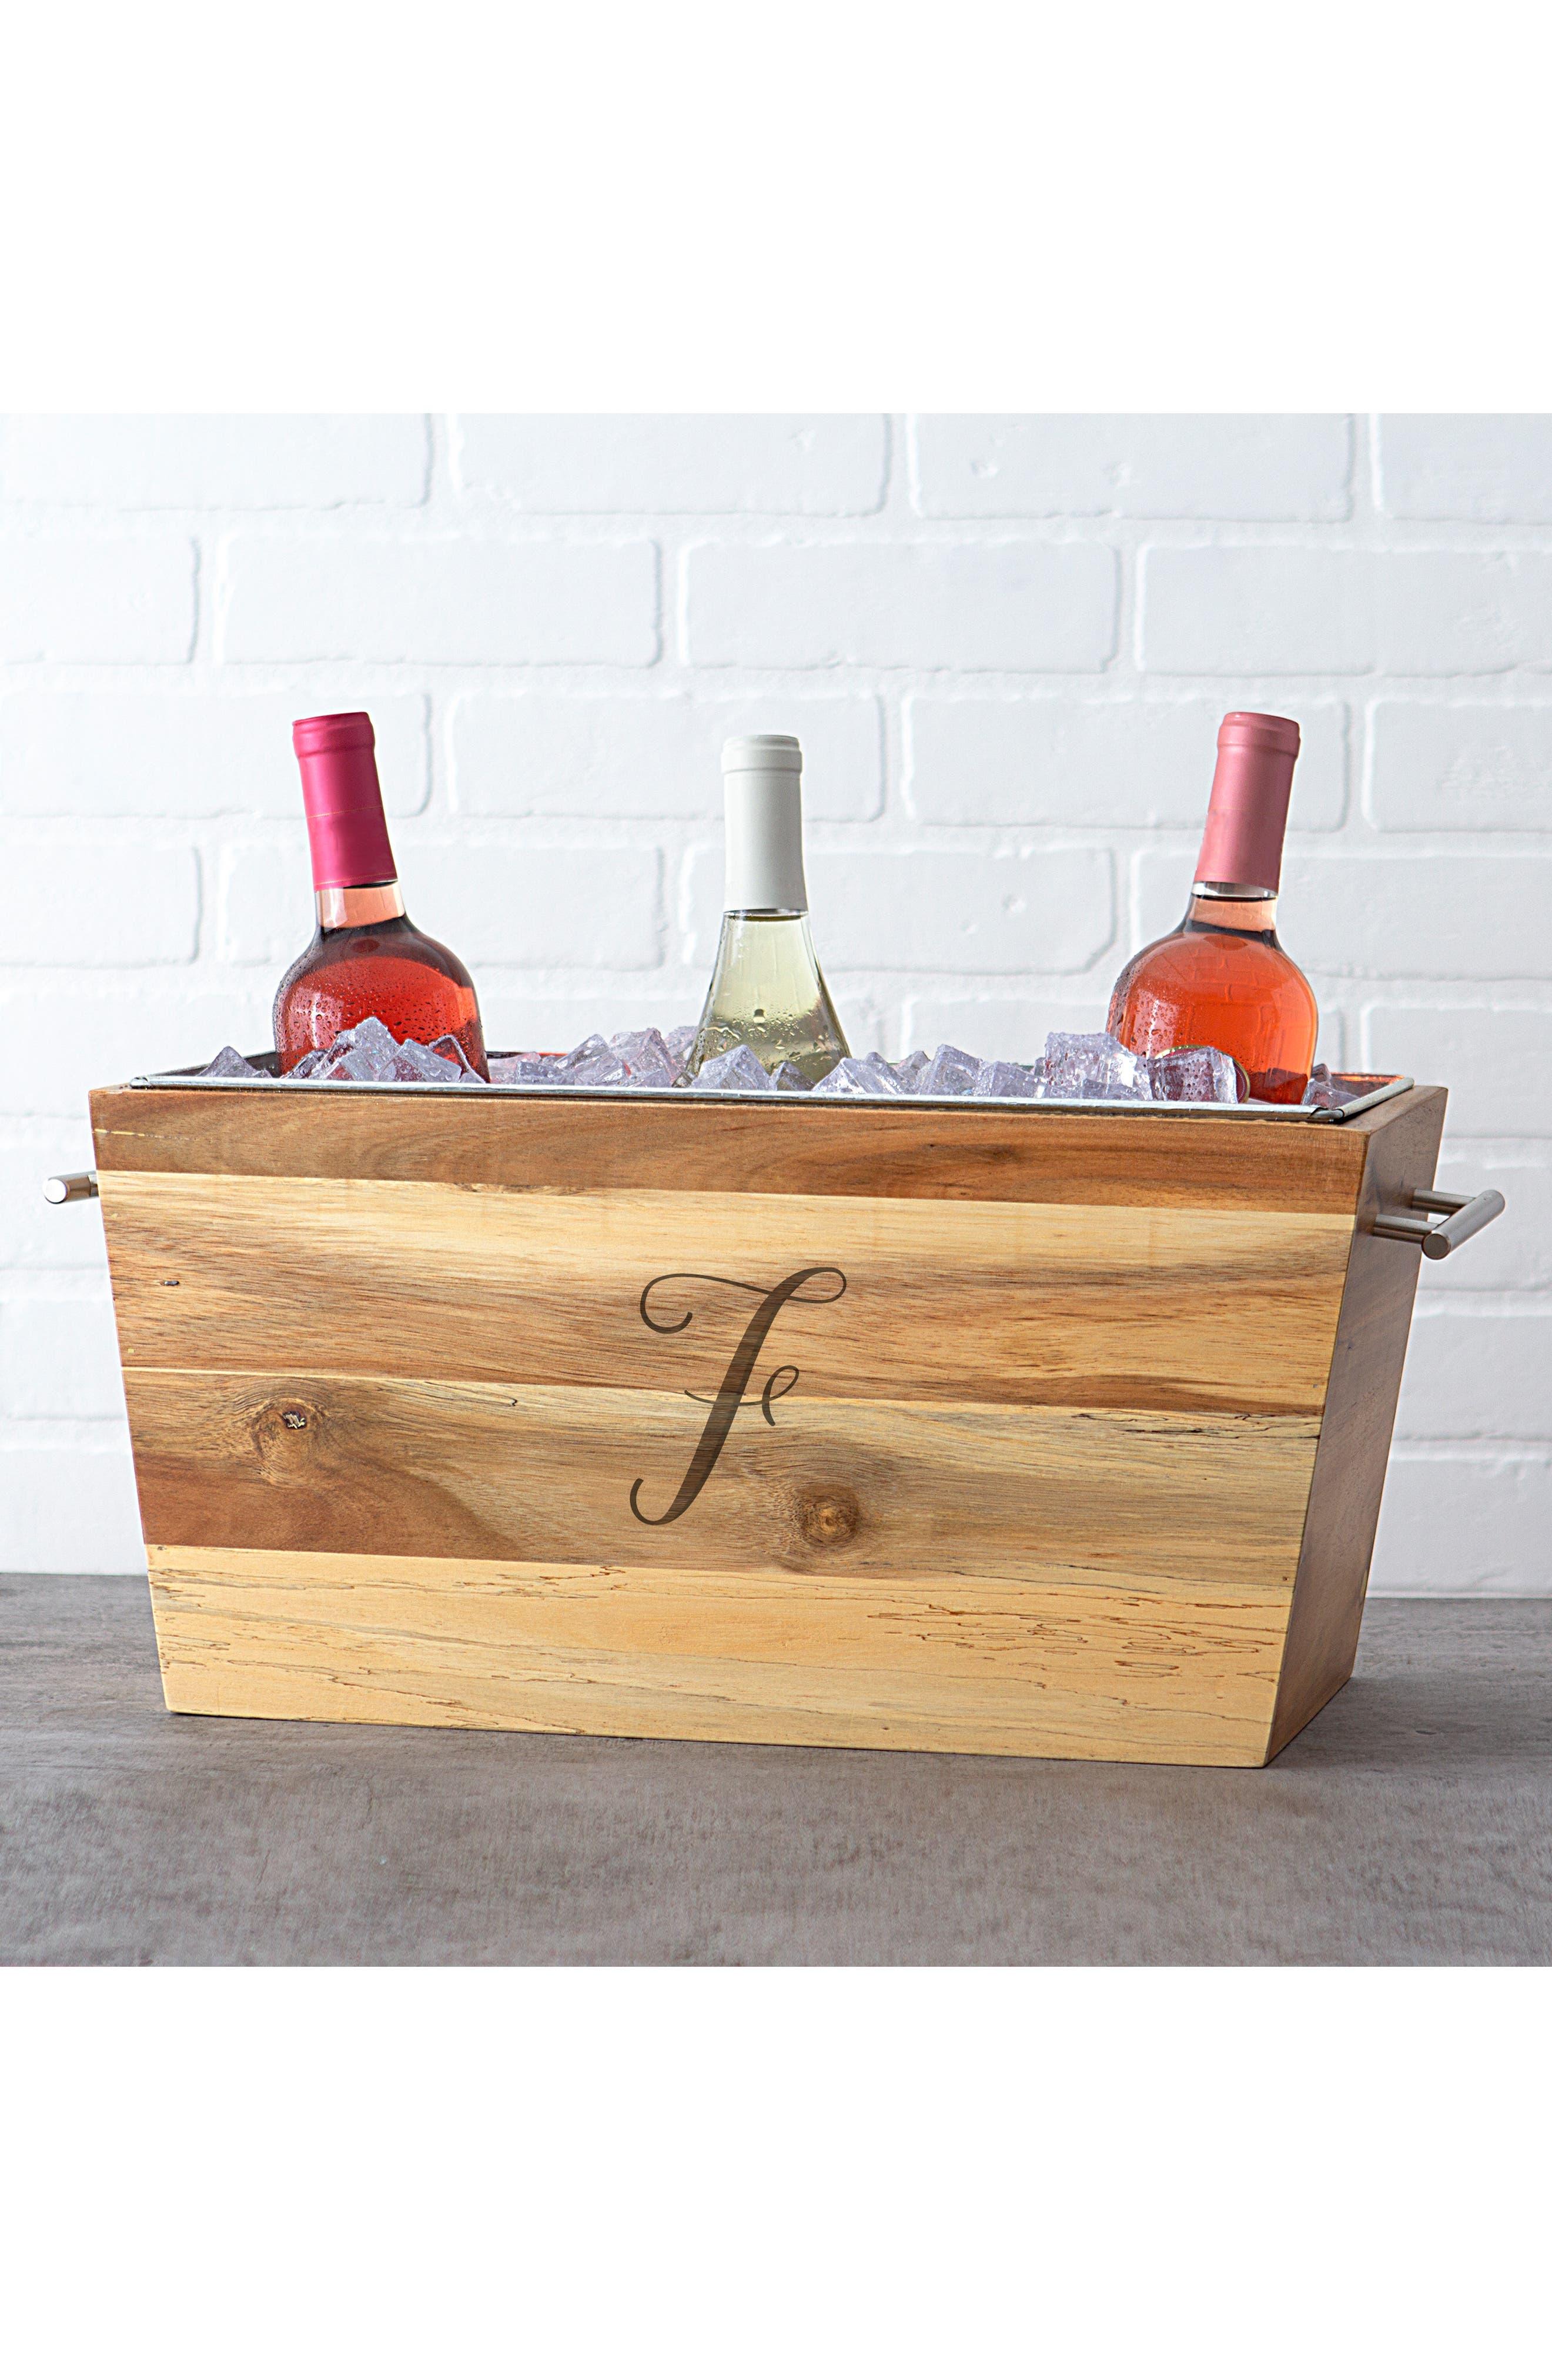 Monogram Wood Wine Trough,                             Alternate thumbnail 5, color,                             BROWN